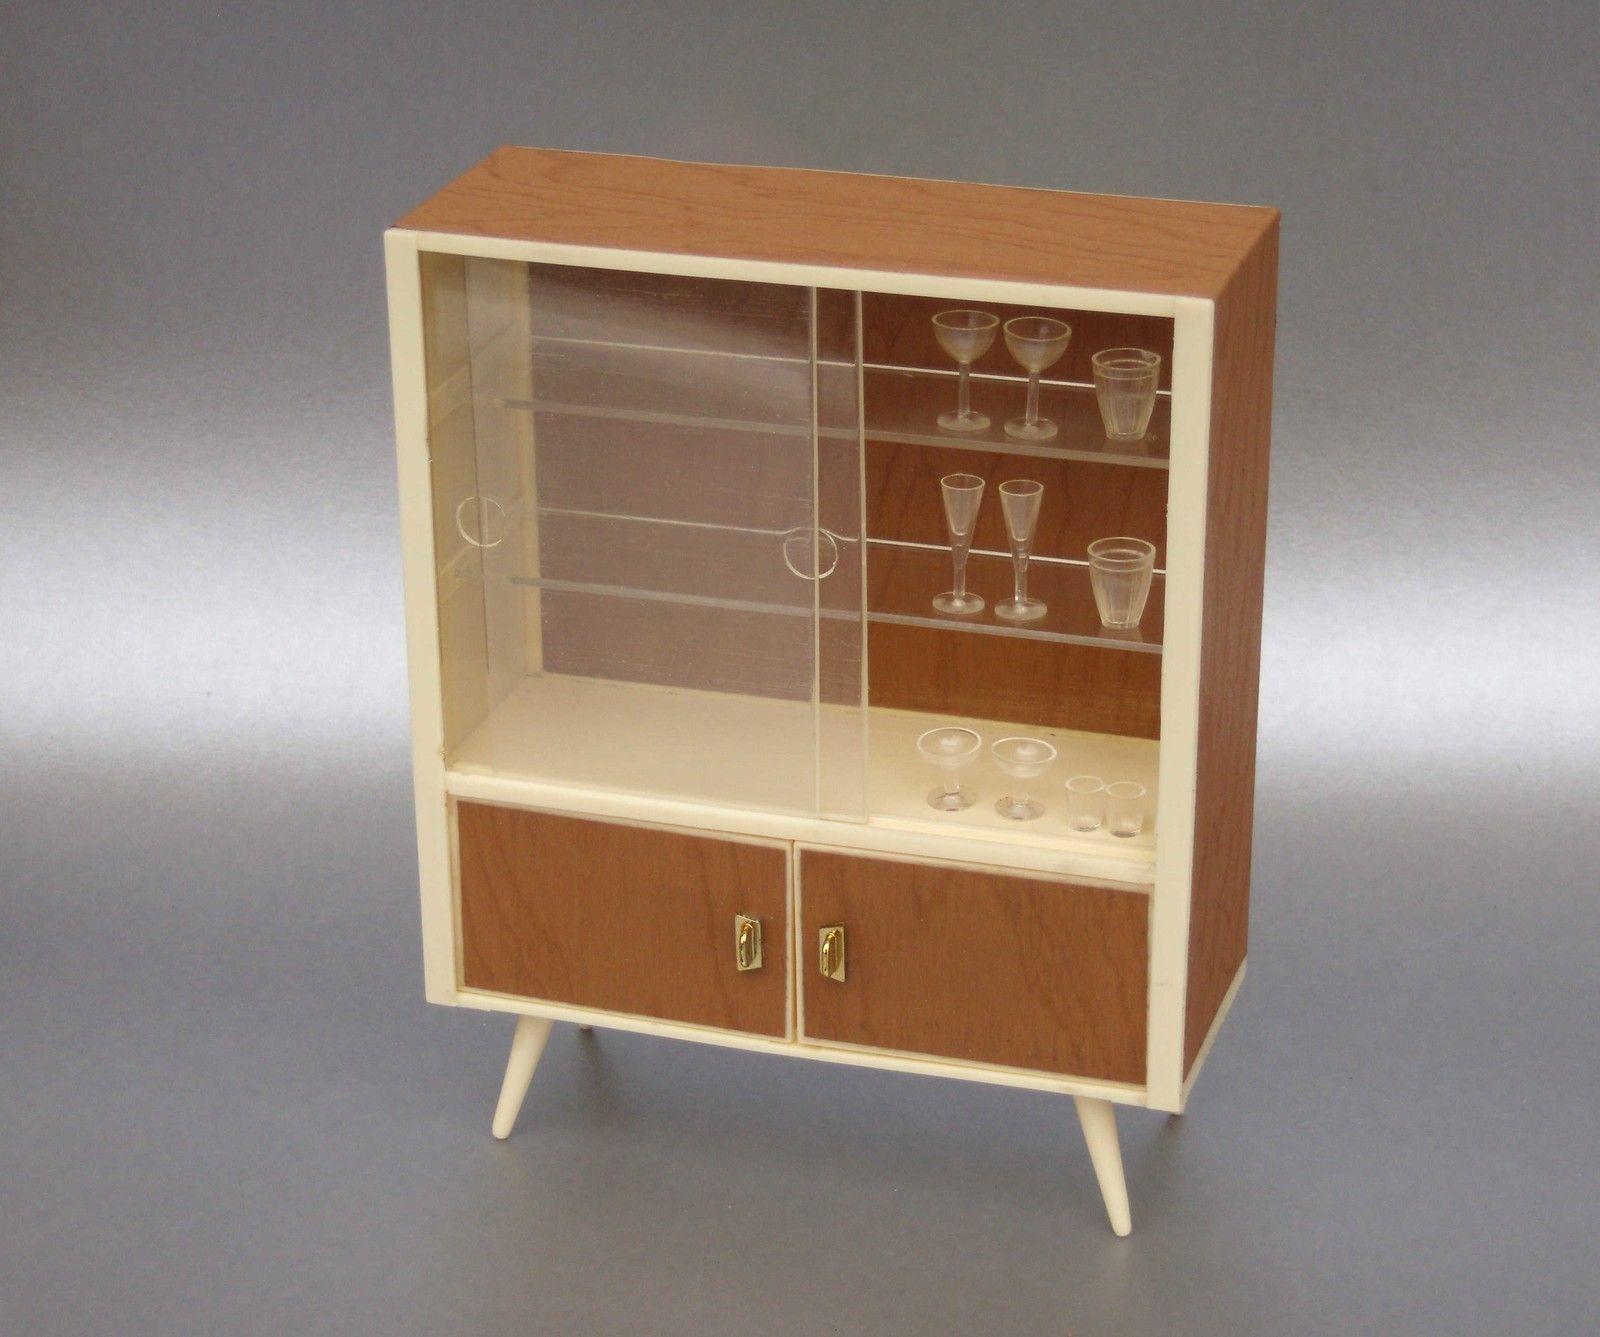 mid century modern dollhouse furniture. Mid Century Modern Dollhouse Furniture. Vtg 11pc Crailsheimer Mid-century China Cabinet Furniture D